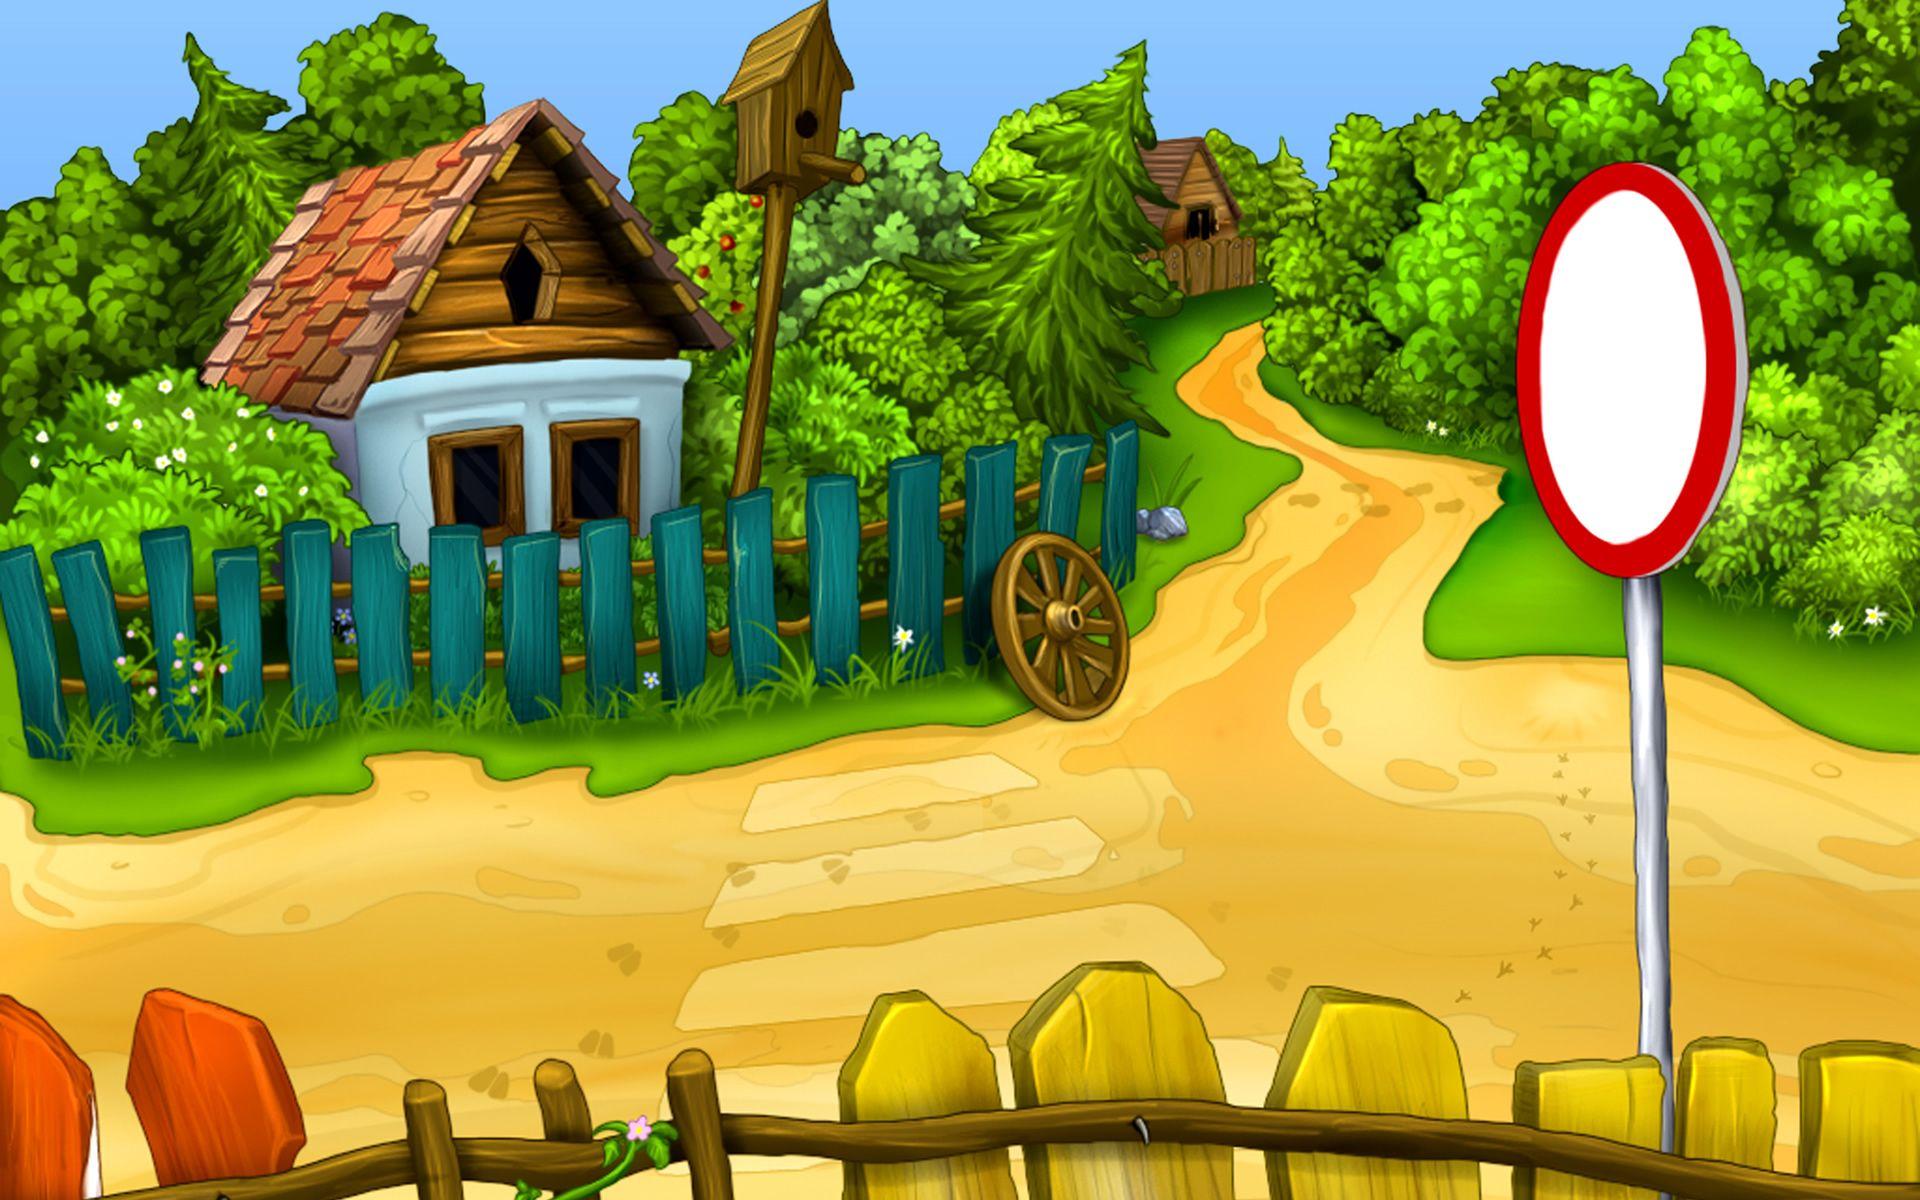 Cartoon Background 스톡 이미지 로열티 프리 이미지 및 벡터